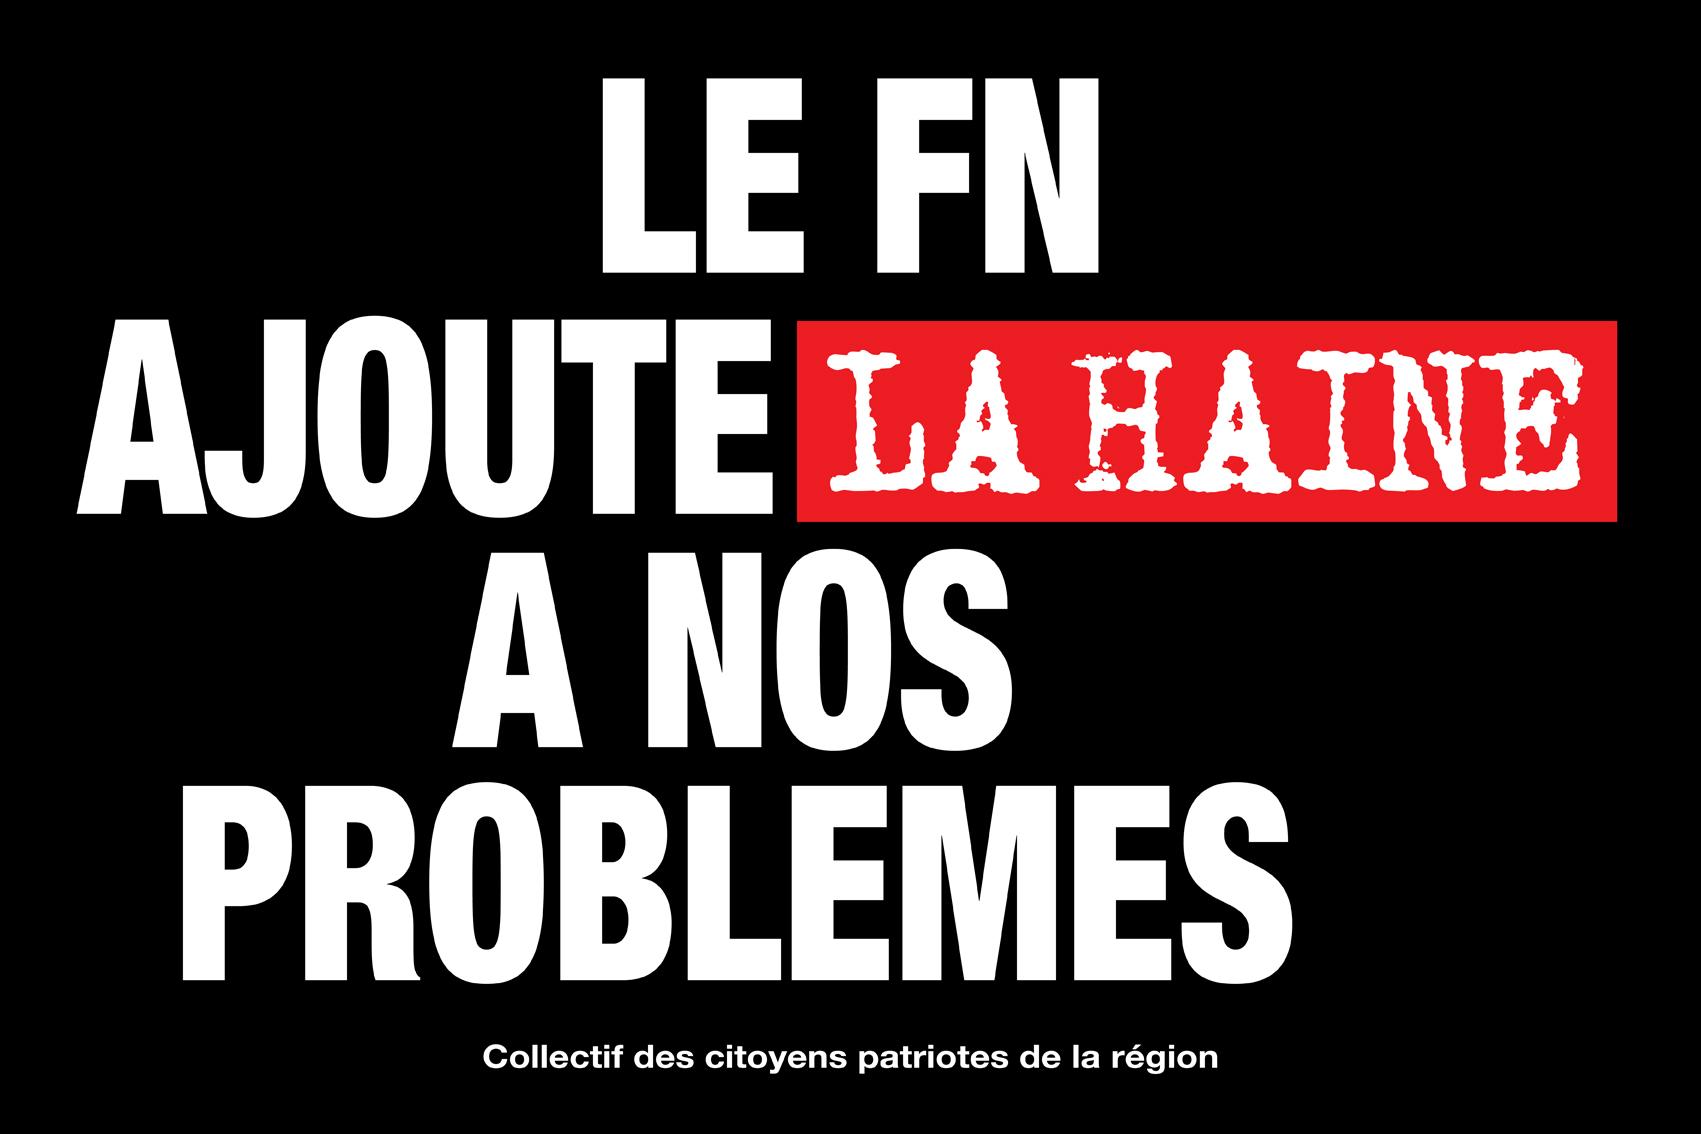 2015-12-04-1449238941-1638902-fnajoutehaineprobleme.jpg